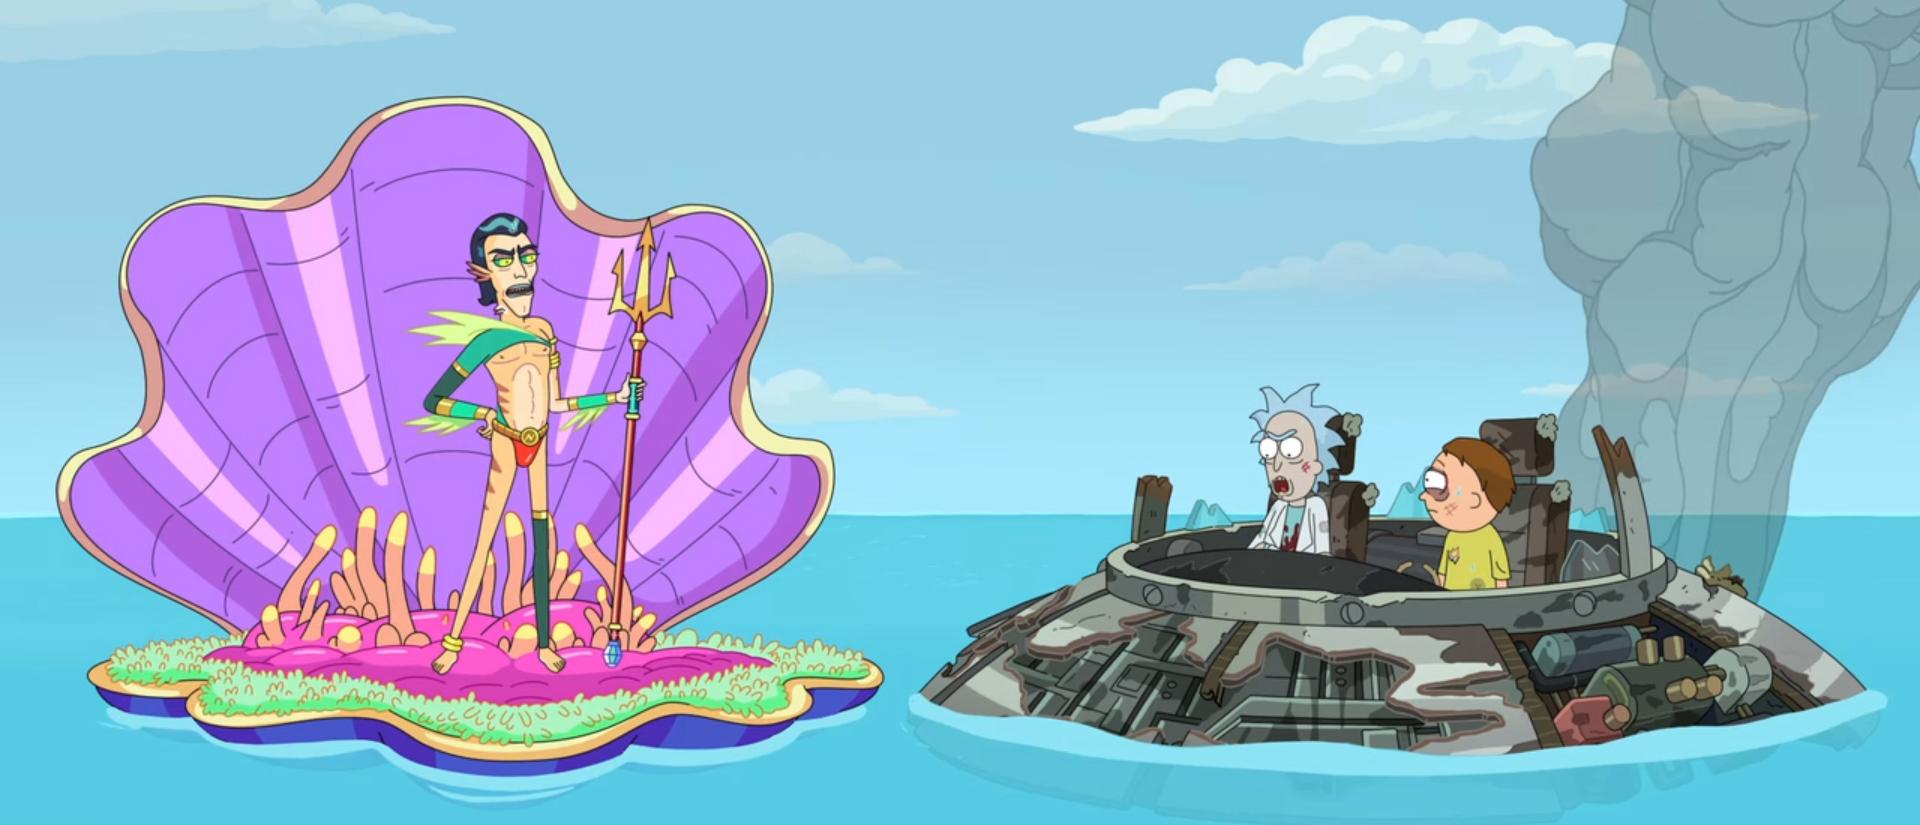 Rick and Morty. Image Credit: Netflix.